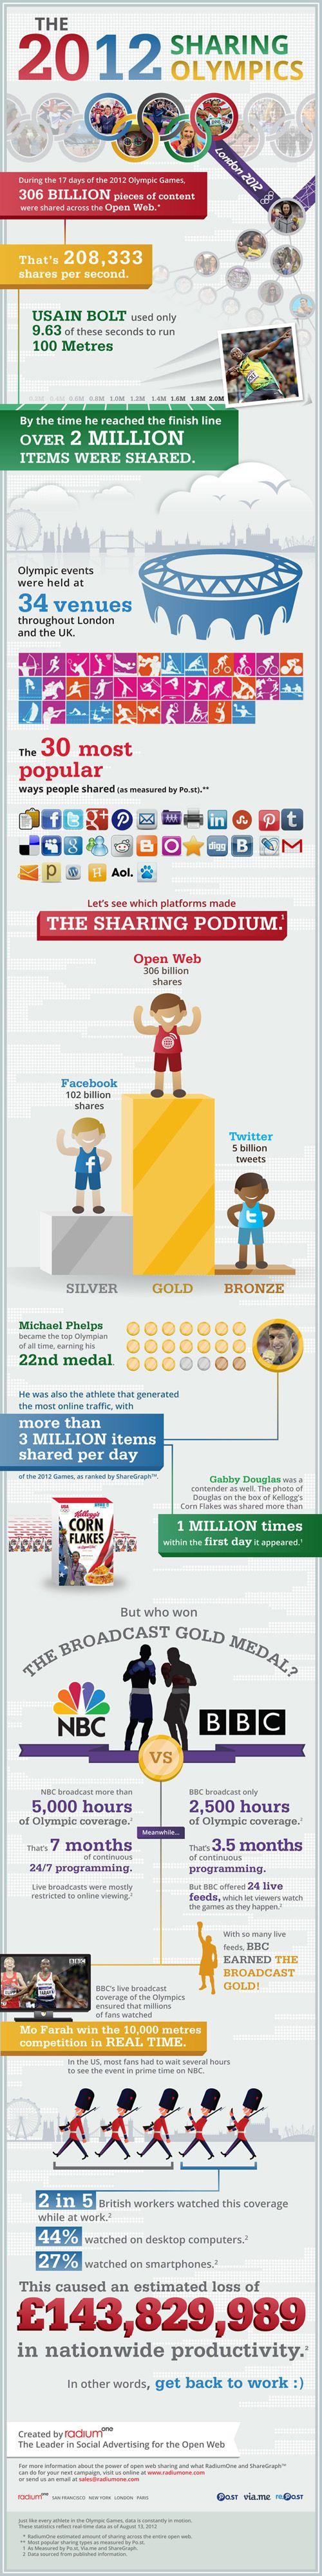 2012 Olympic Facts #London2012 #Olympics